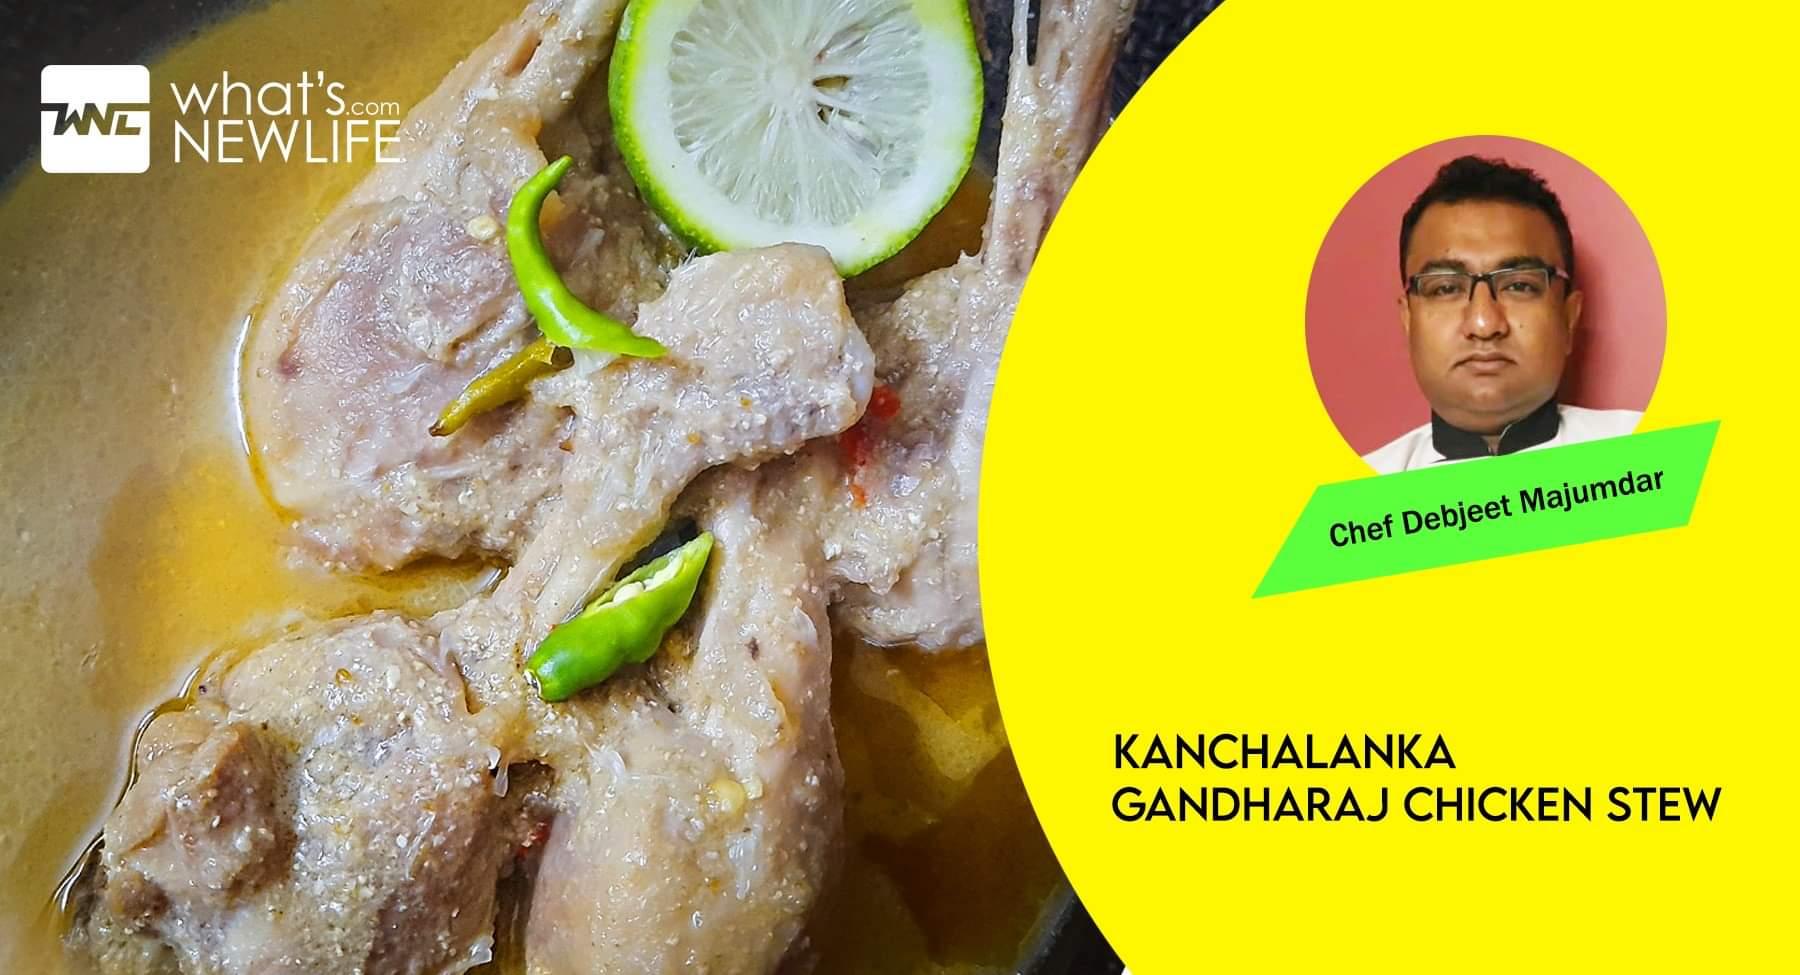 Kanchalanka Gandharaj Chicken Stew